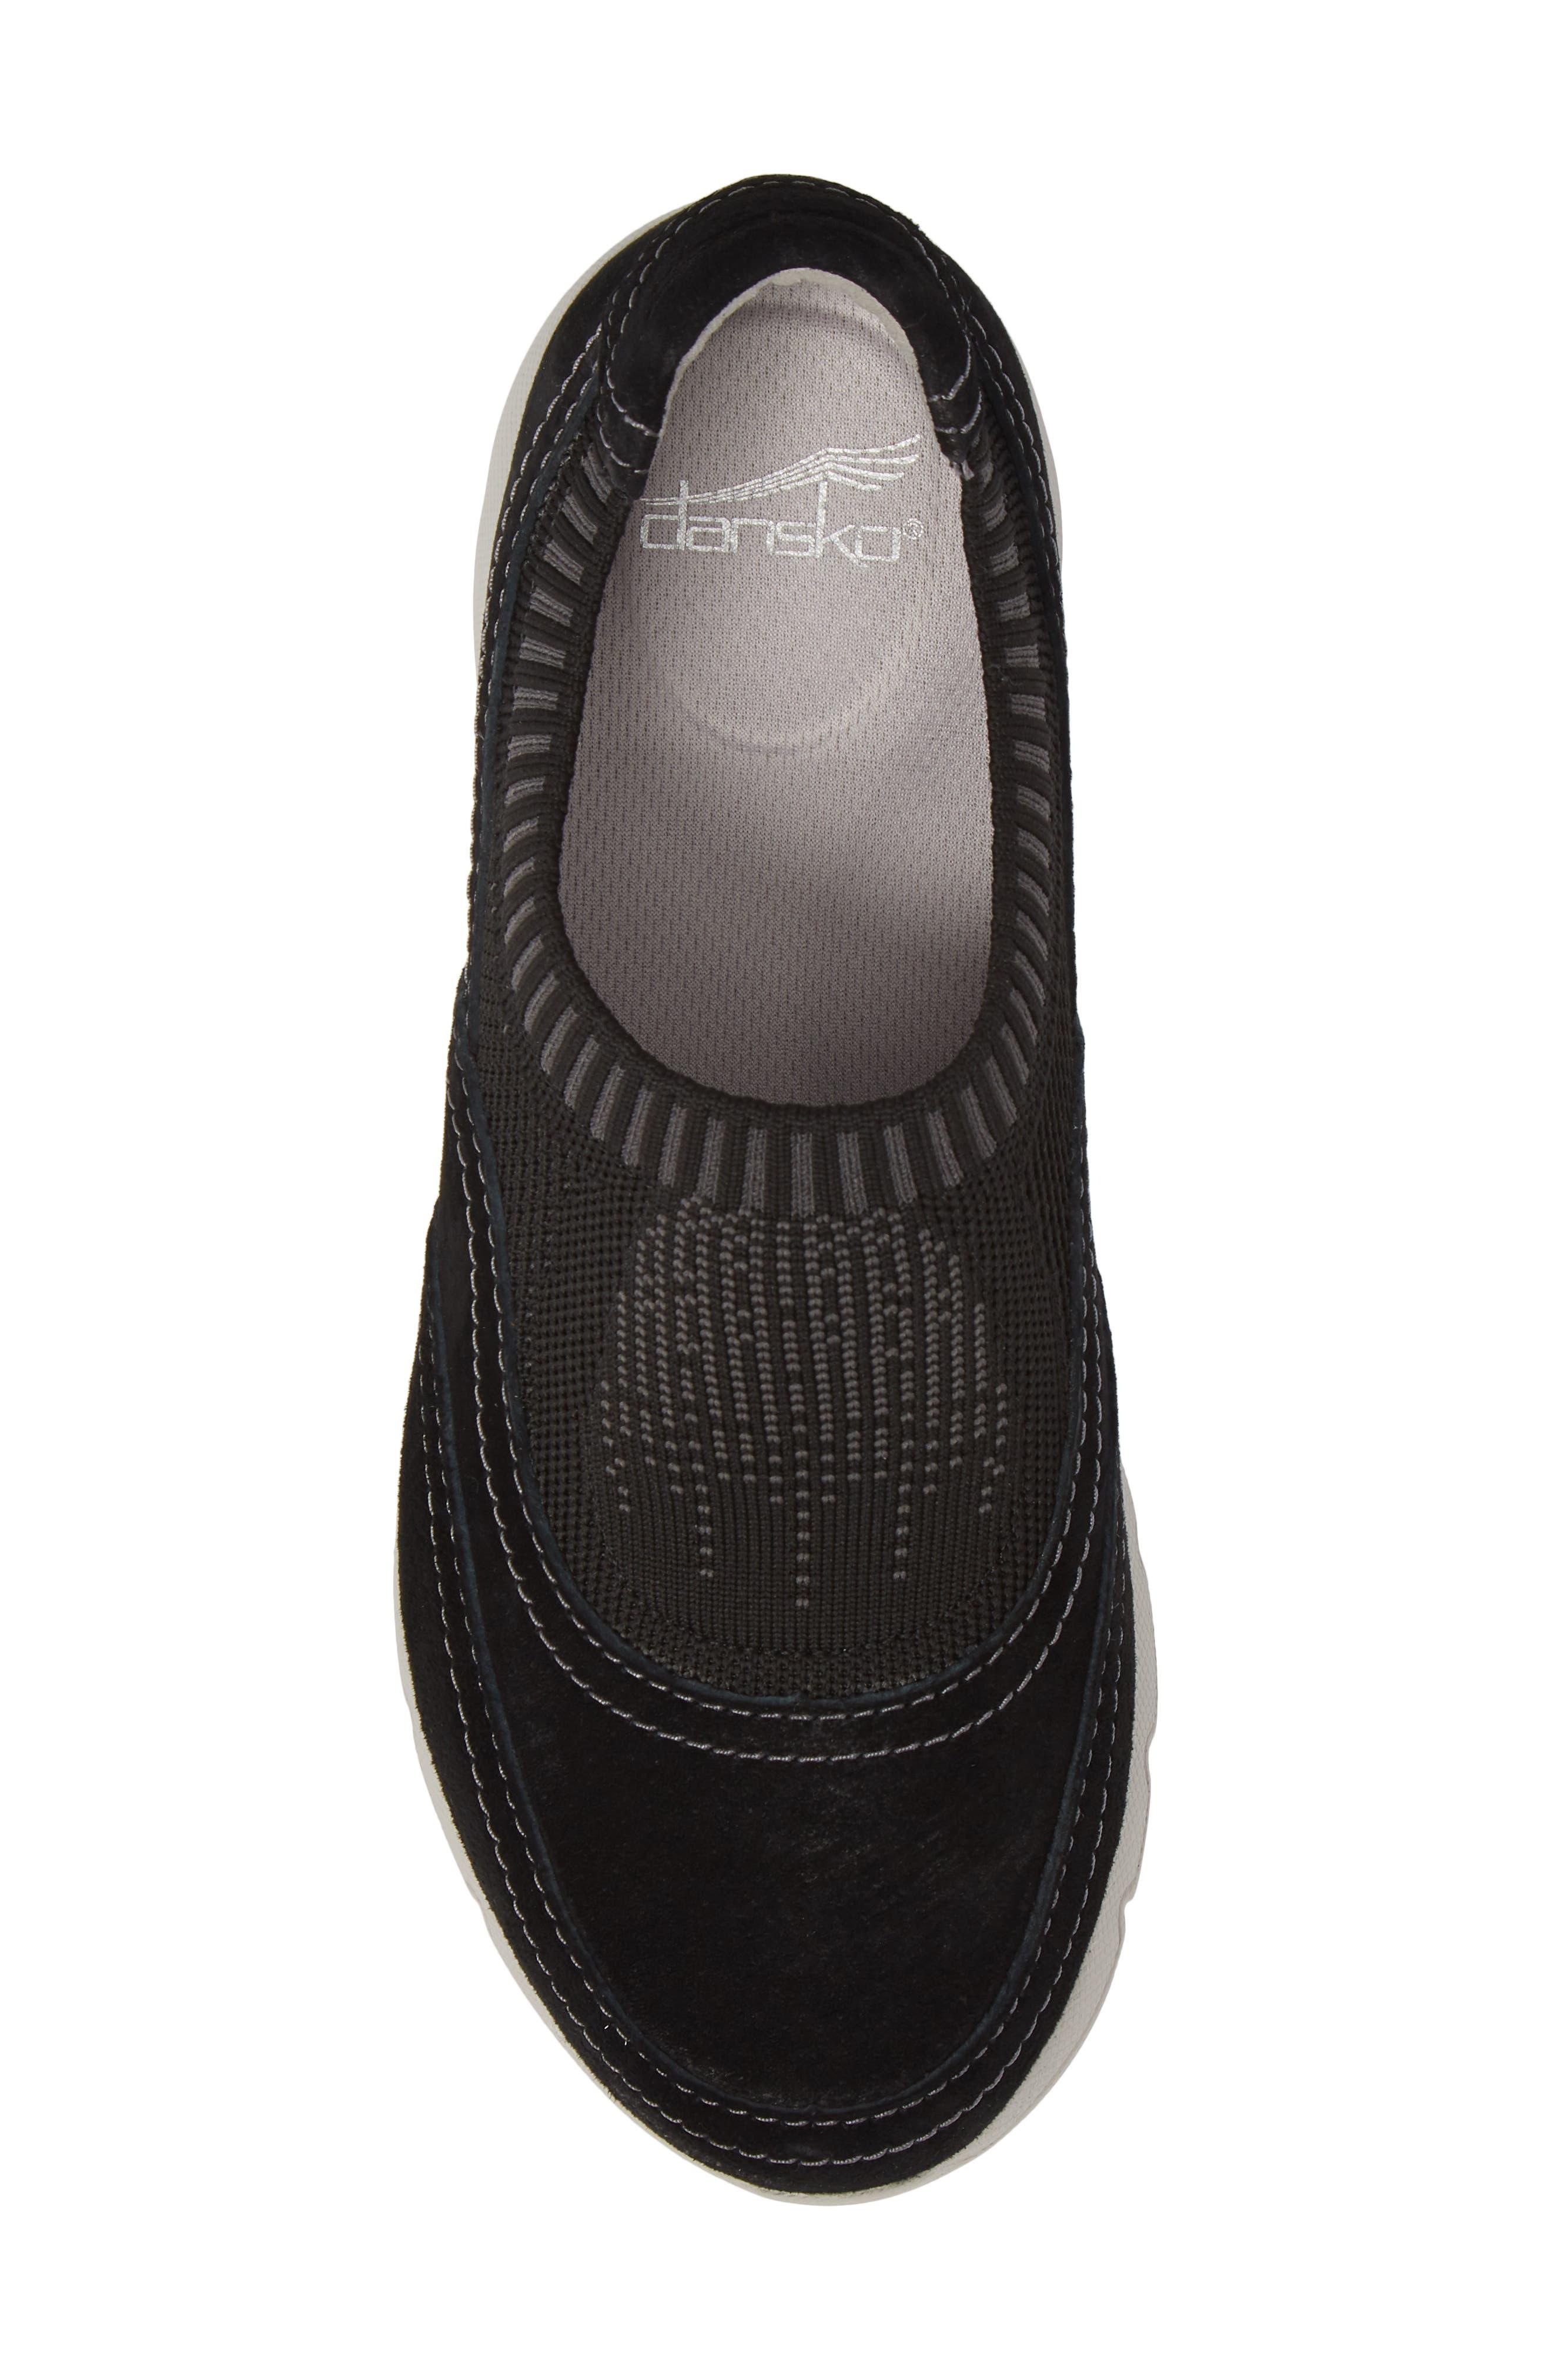 Alice Slip-On Sneaker,                             Alternate thumbnail 3, color,                             Black Suede